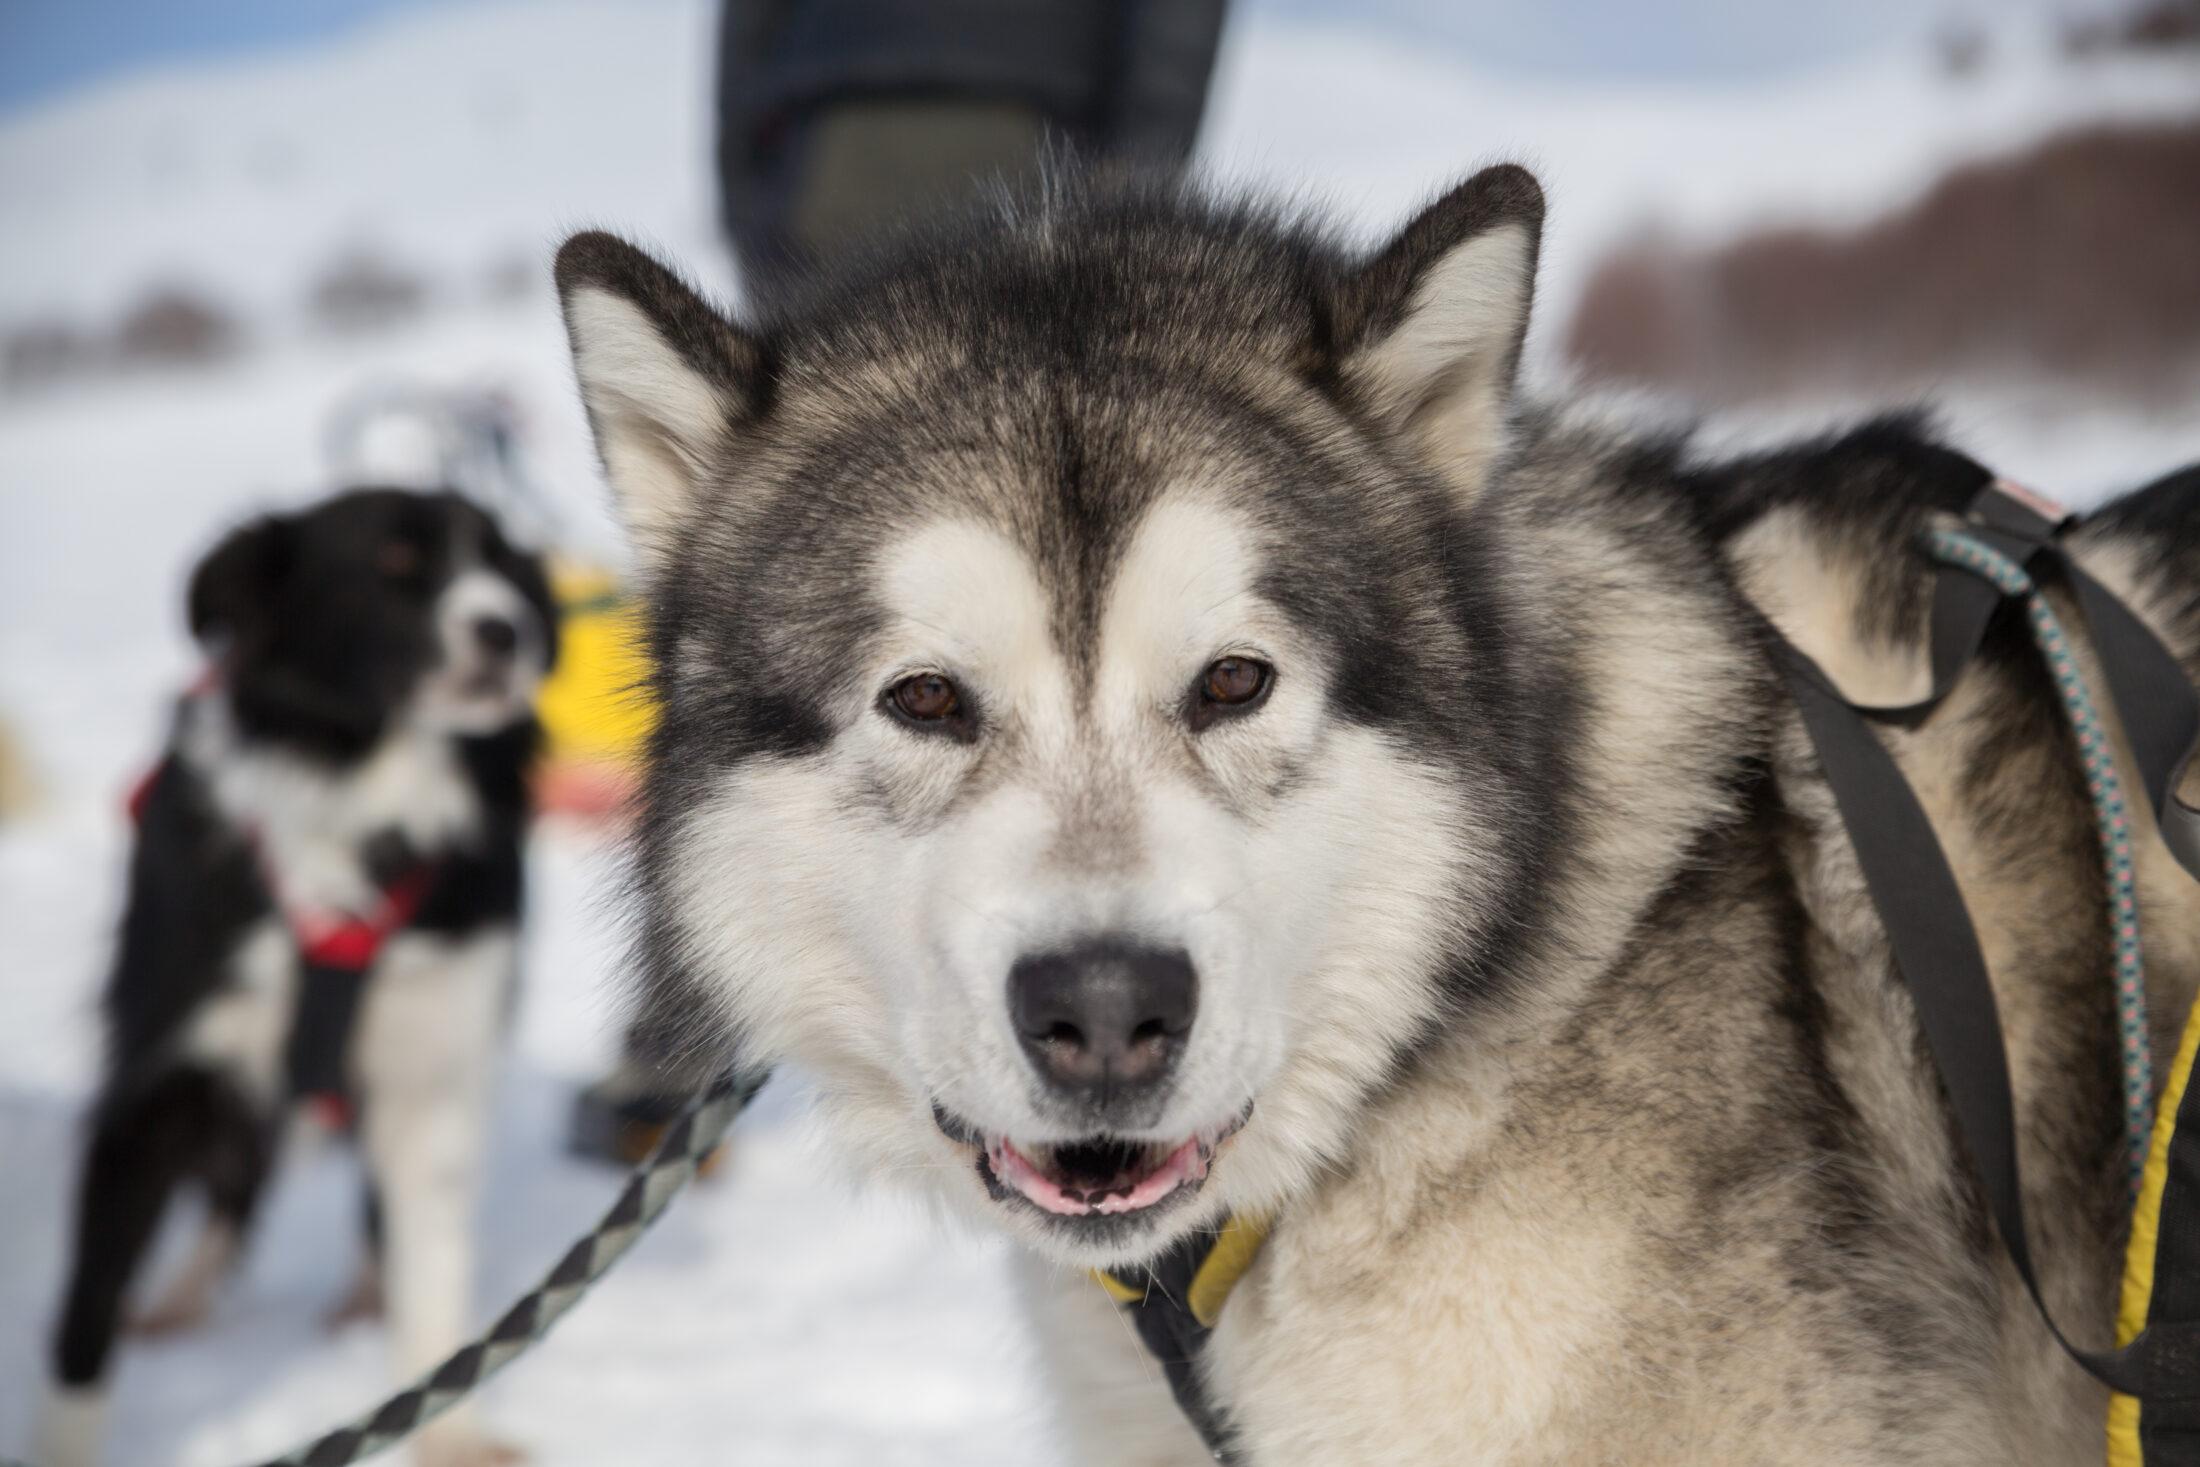 Raça de Cachorro Grande: Malamute do Alasca